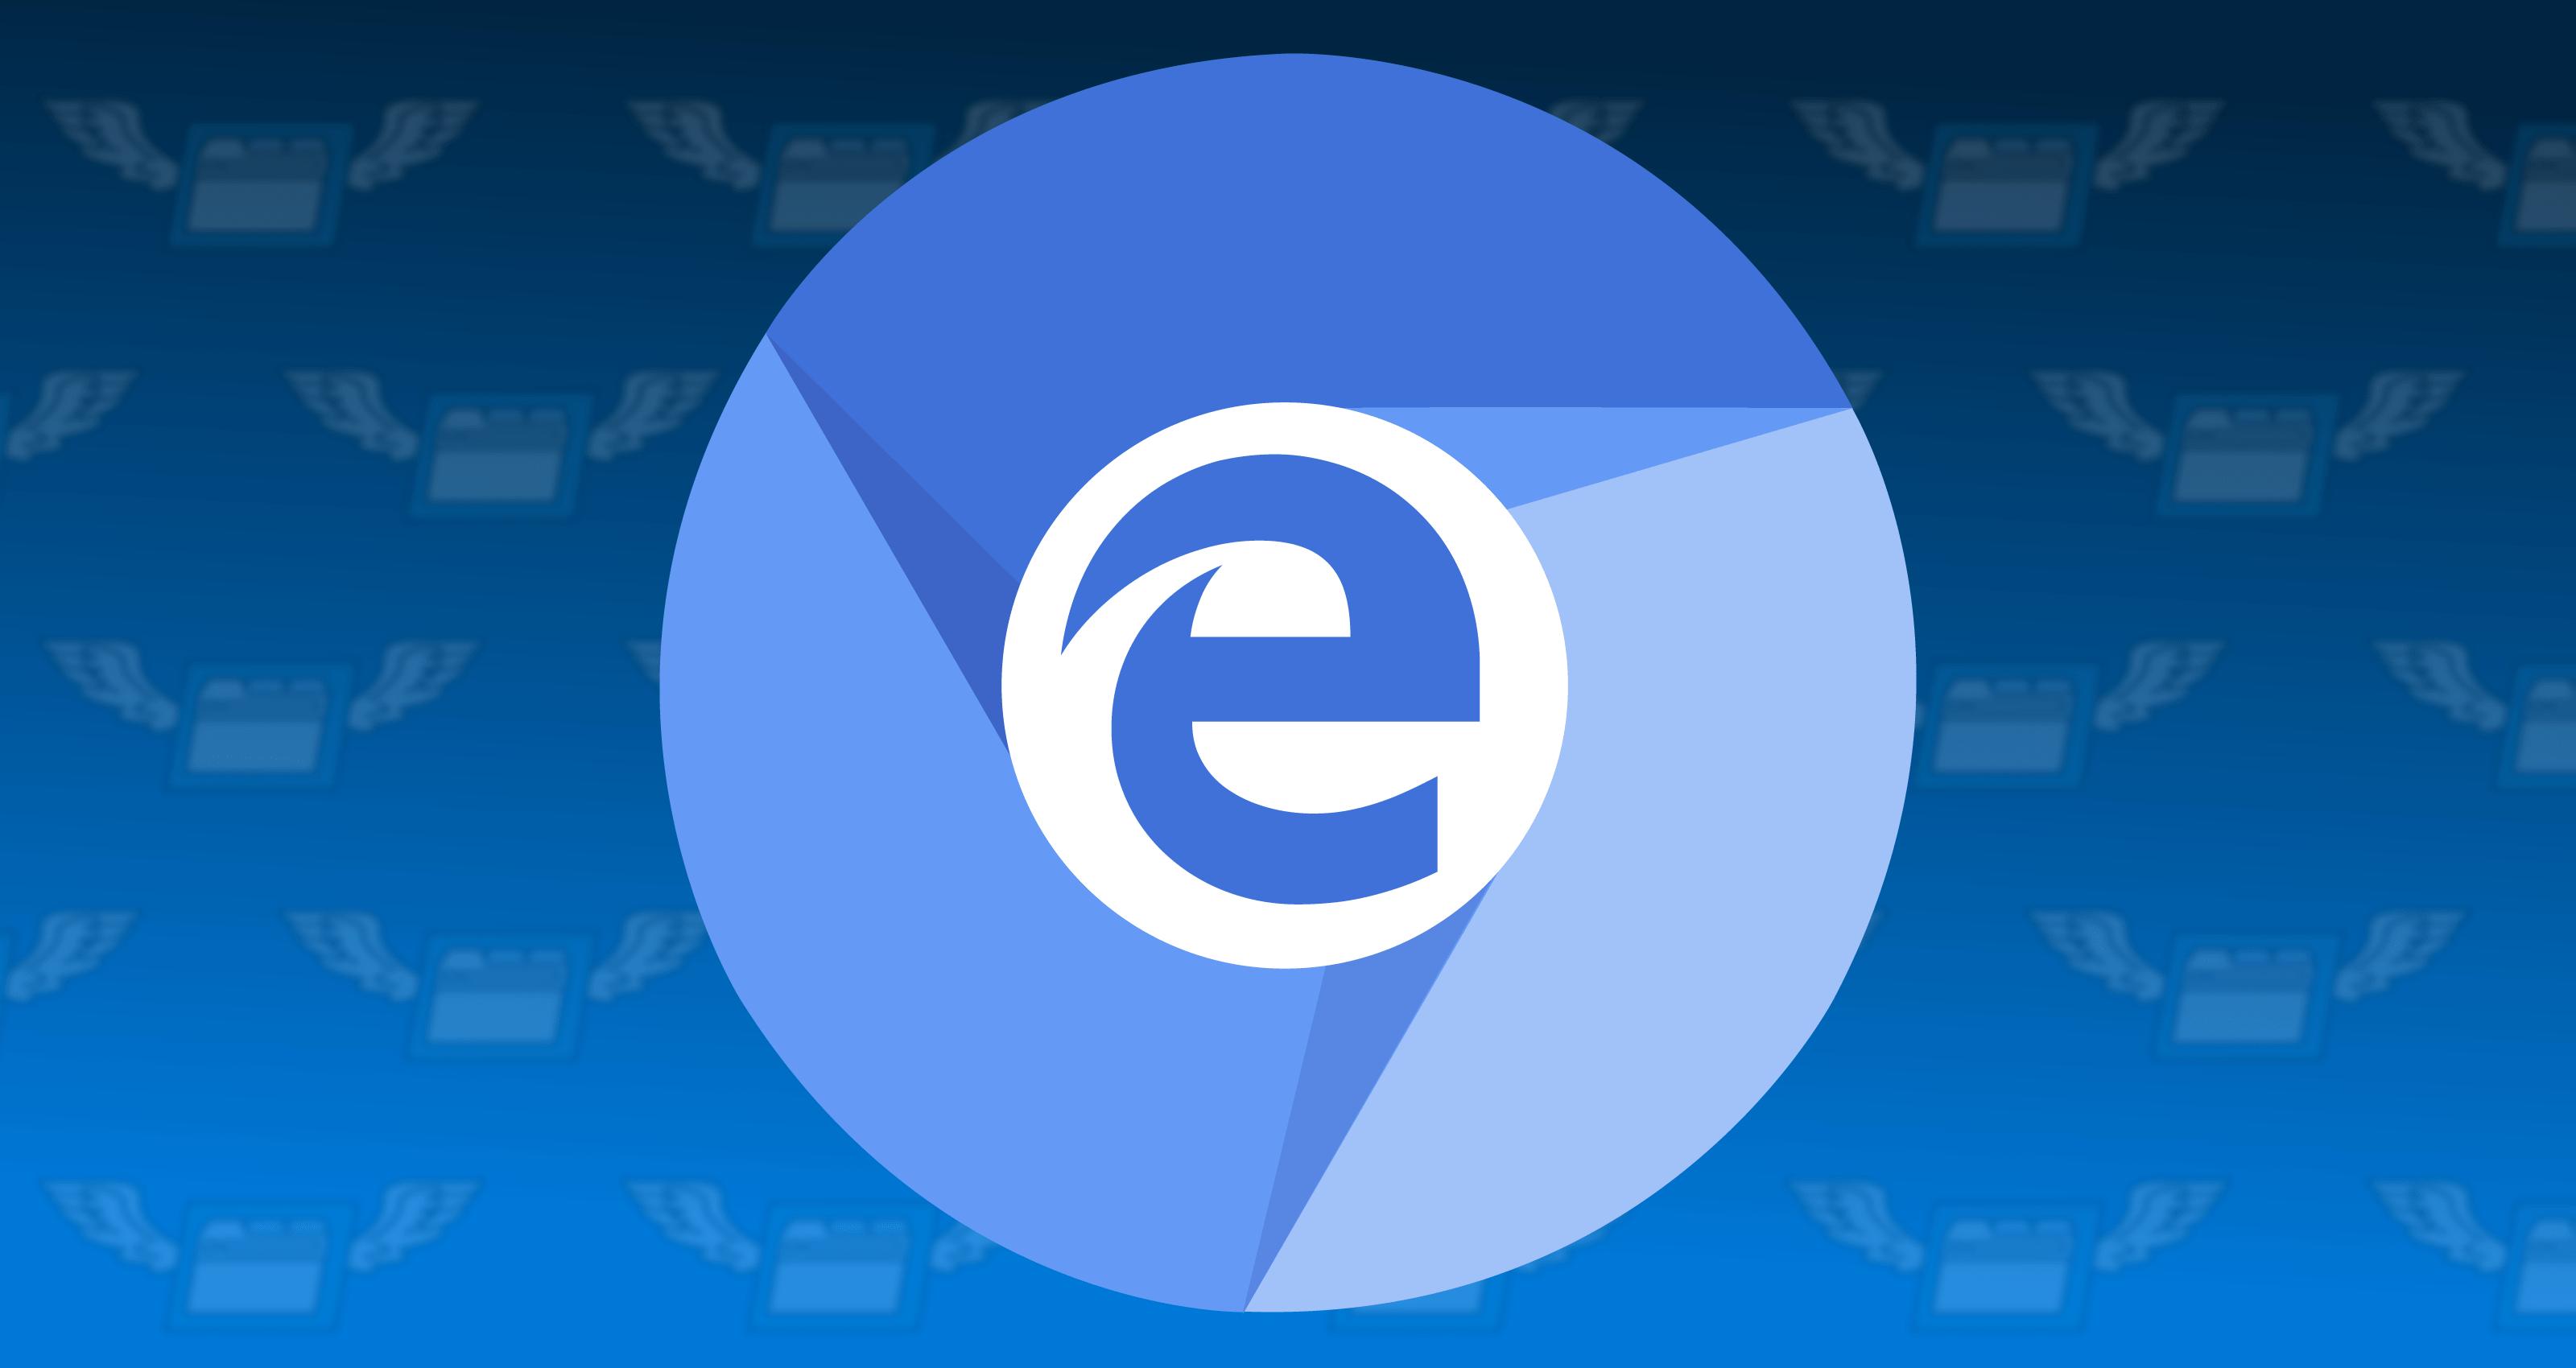 L'anteprima di Microsoft Edge su Linux arriverà ad ottobre